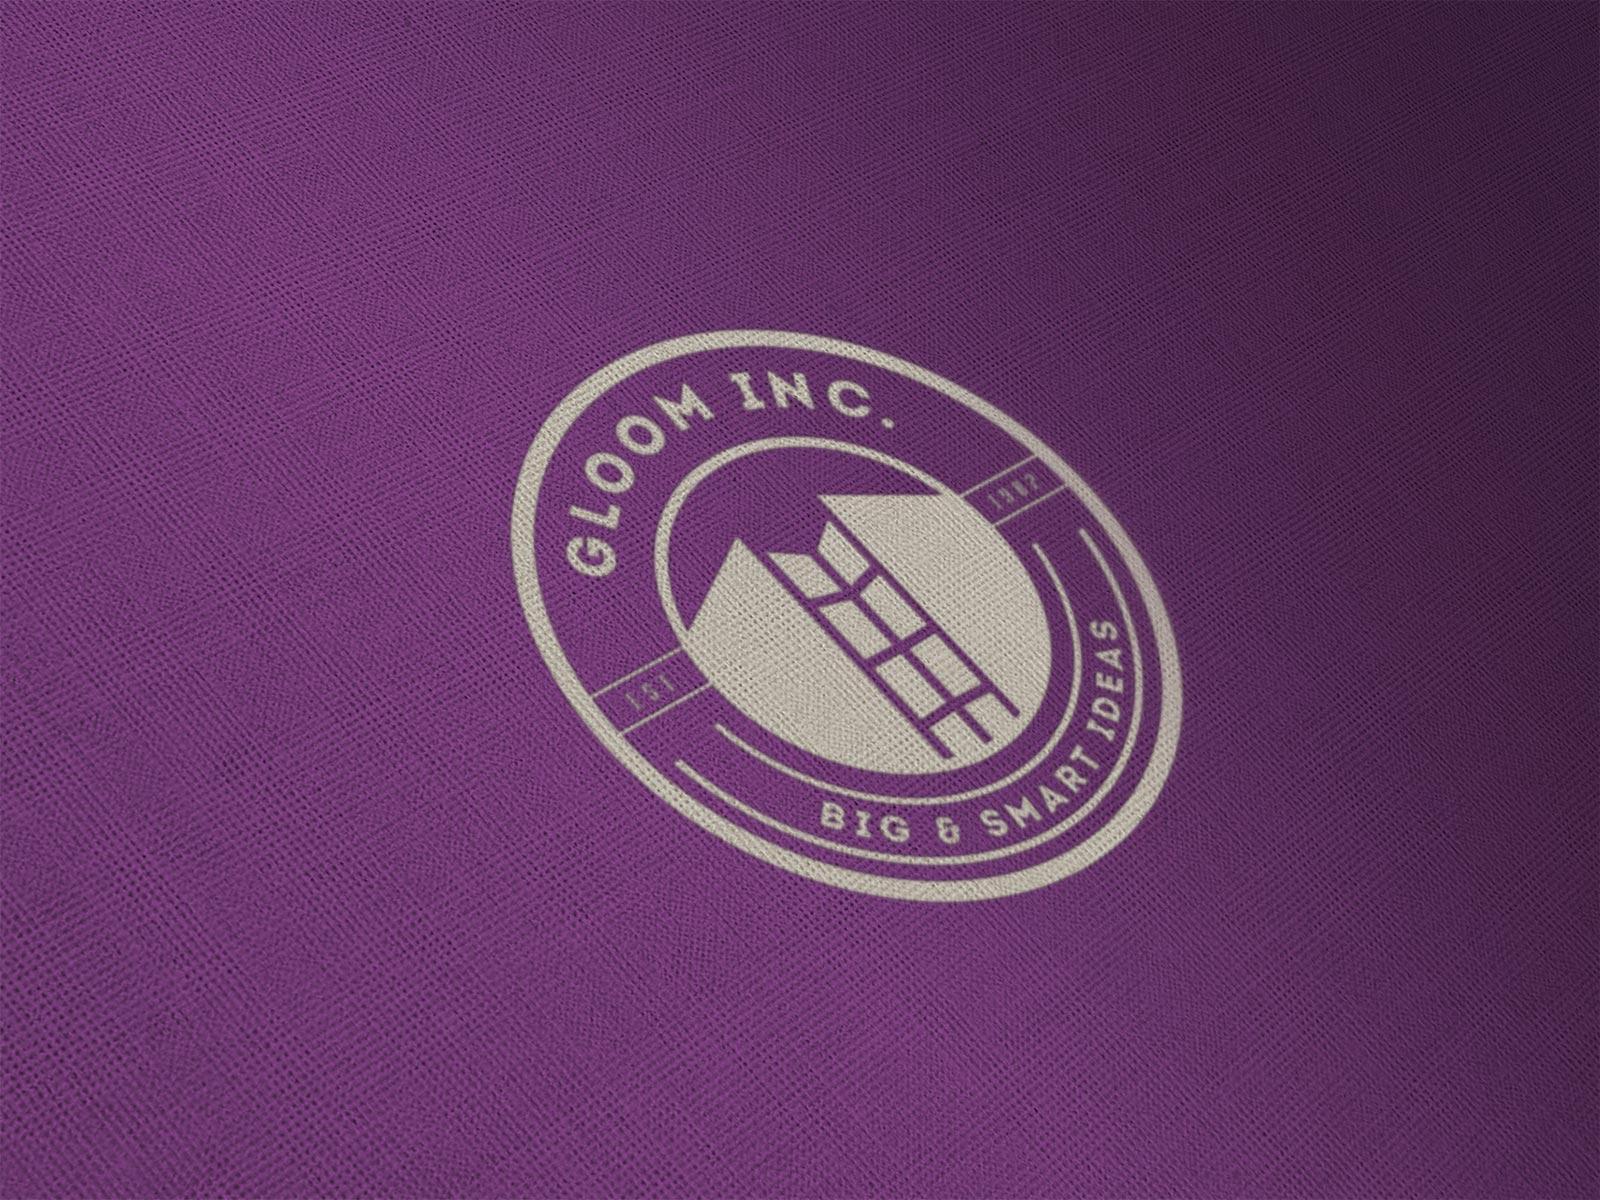 Free-Burlap-Fabric-Cloth-Logo-Mockup-PSD-2